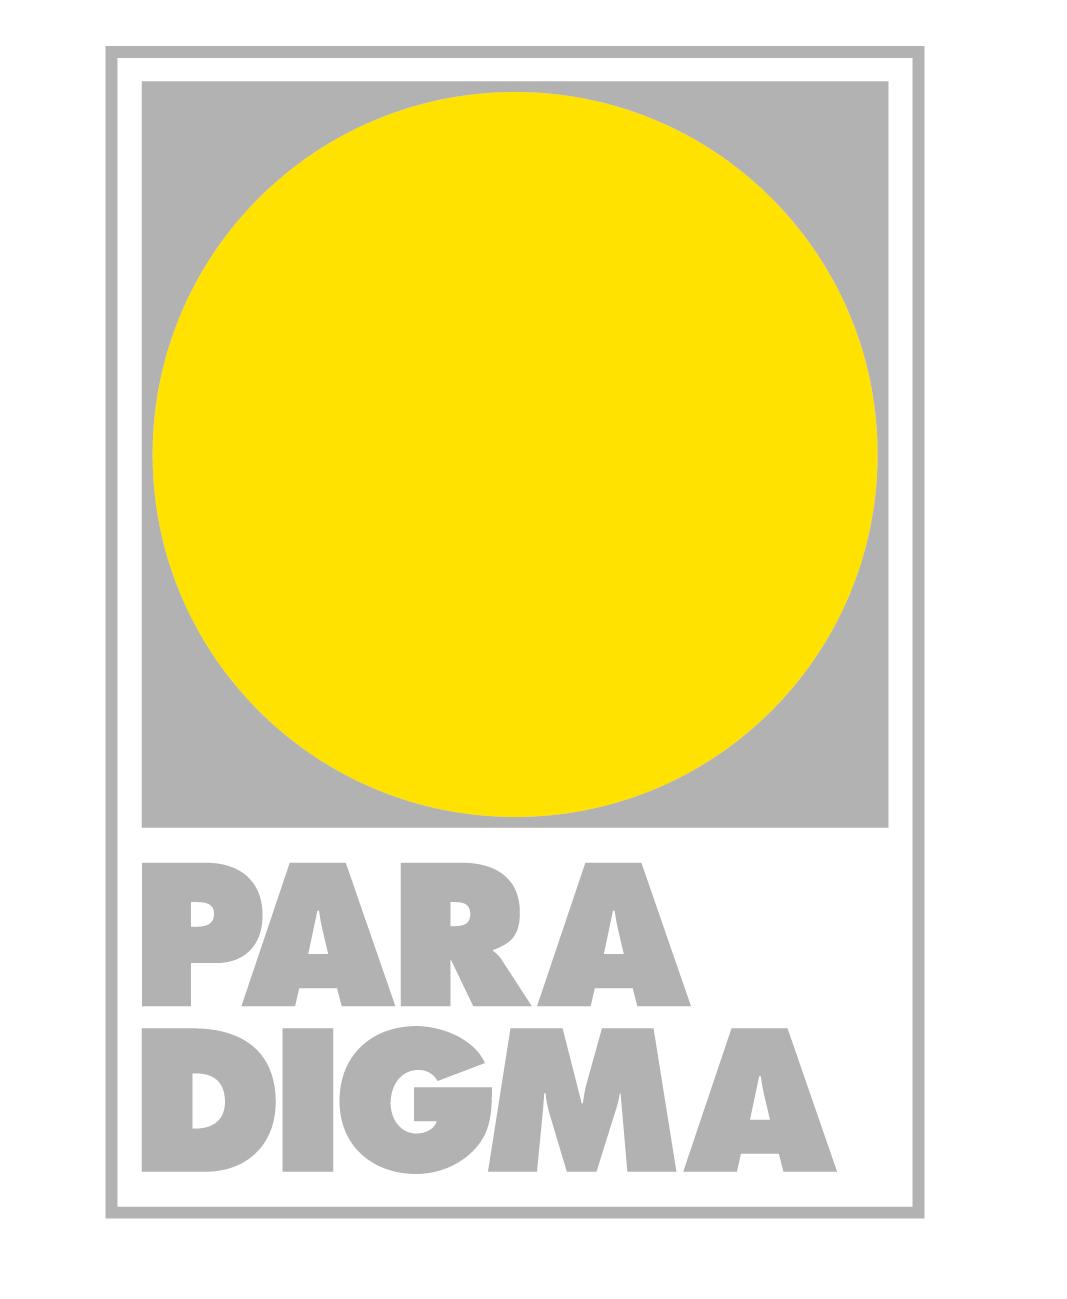 "Paradigma"""